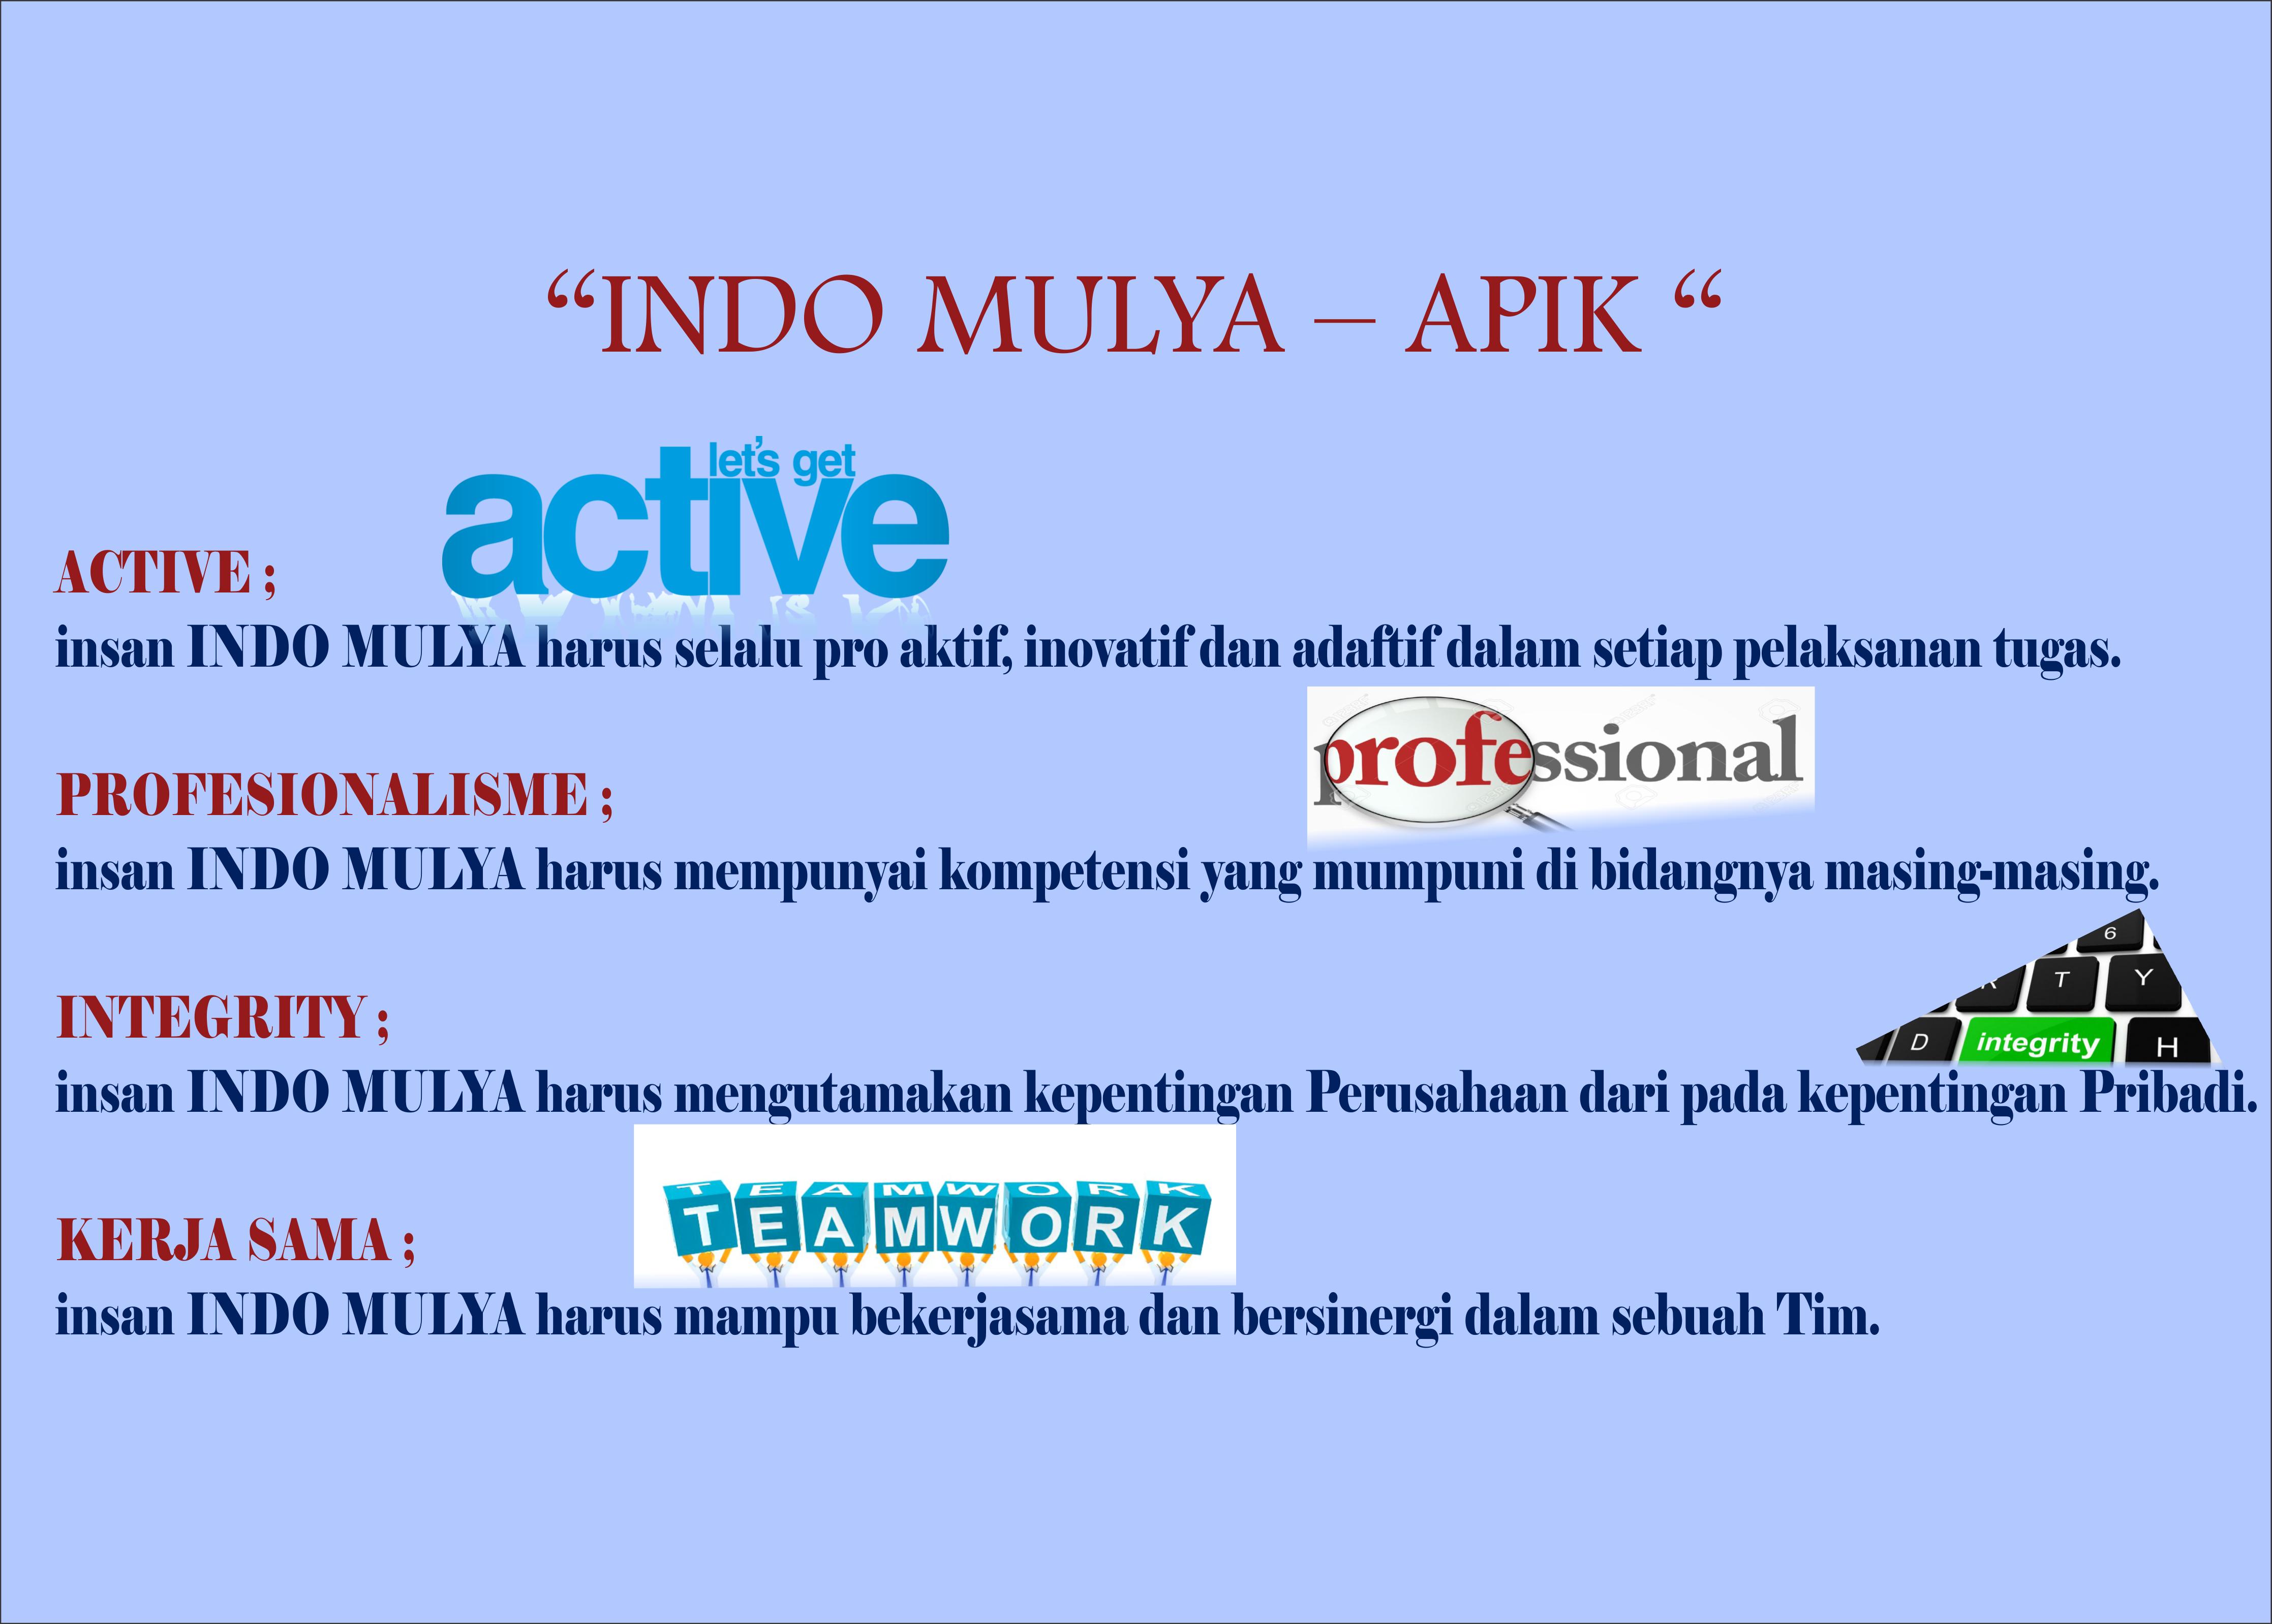 filsat A.P.I.K PT.Indo Mulya